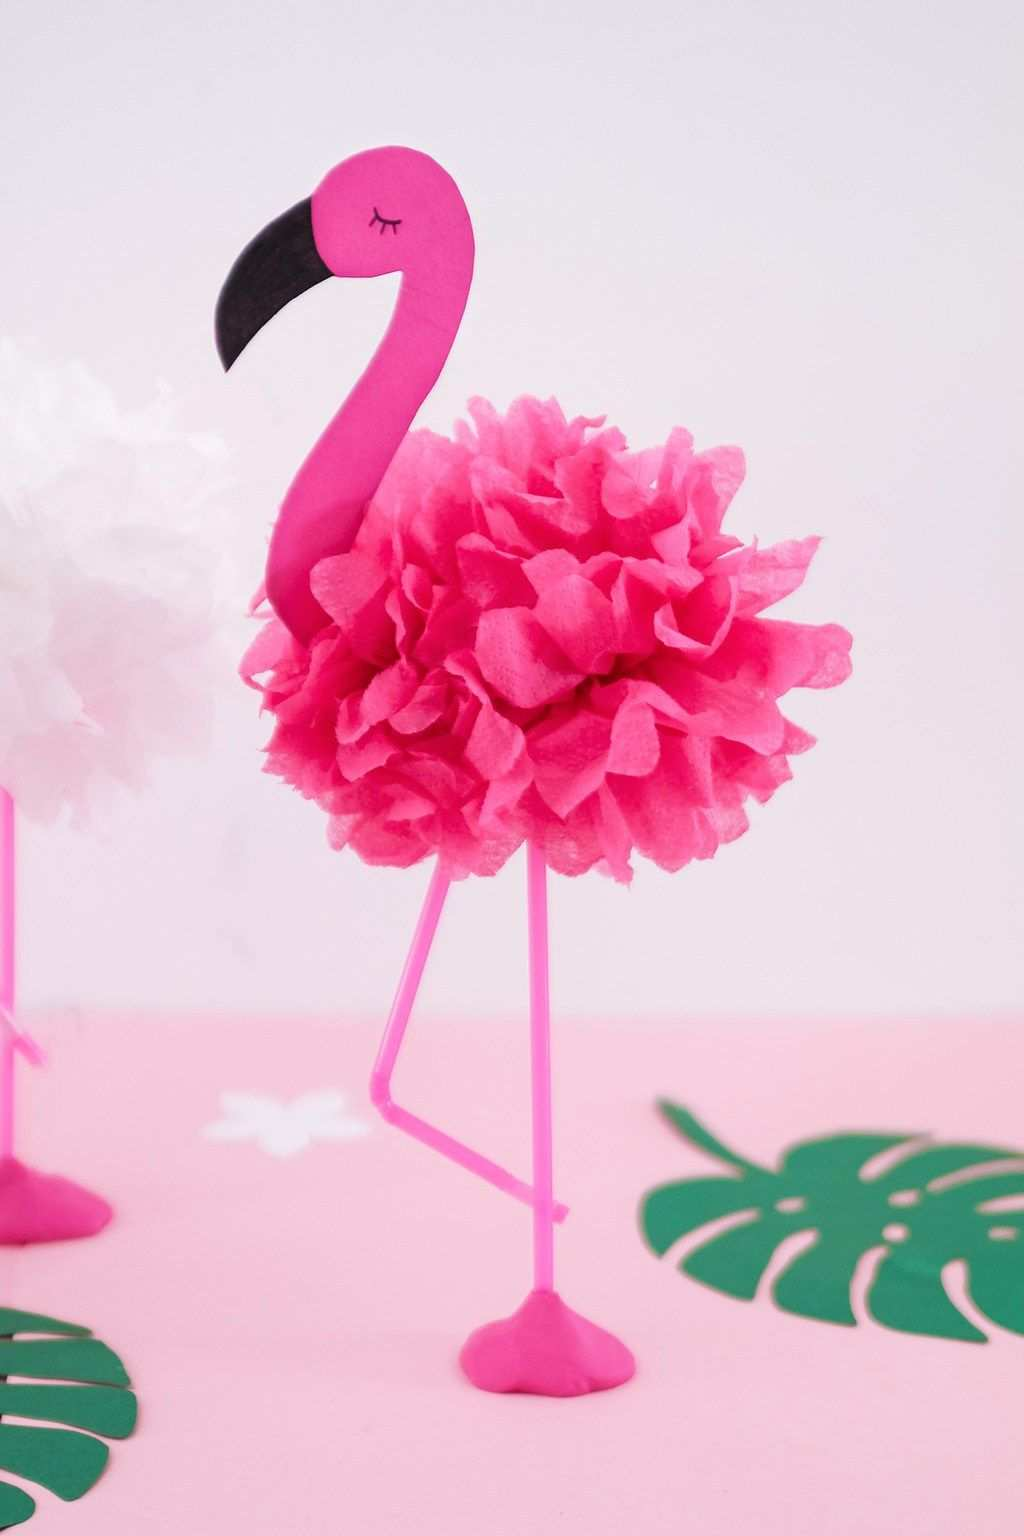 Diy Pompon Flamingos Basteln Ideale Deko Fur Die Nachste Sommerparty Diy Pompons Partydeko Flamingo Geburtstag